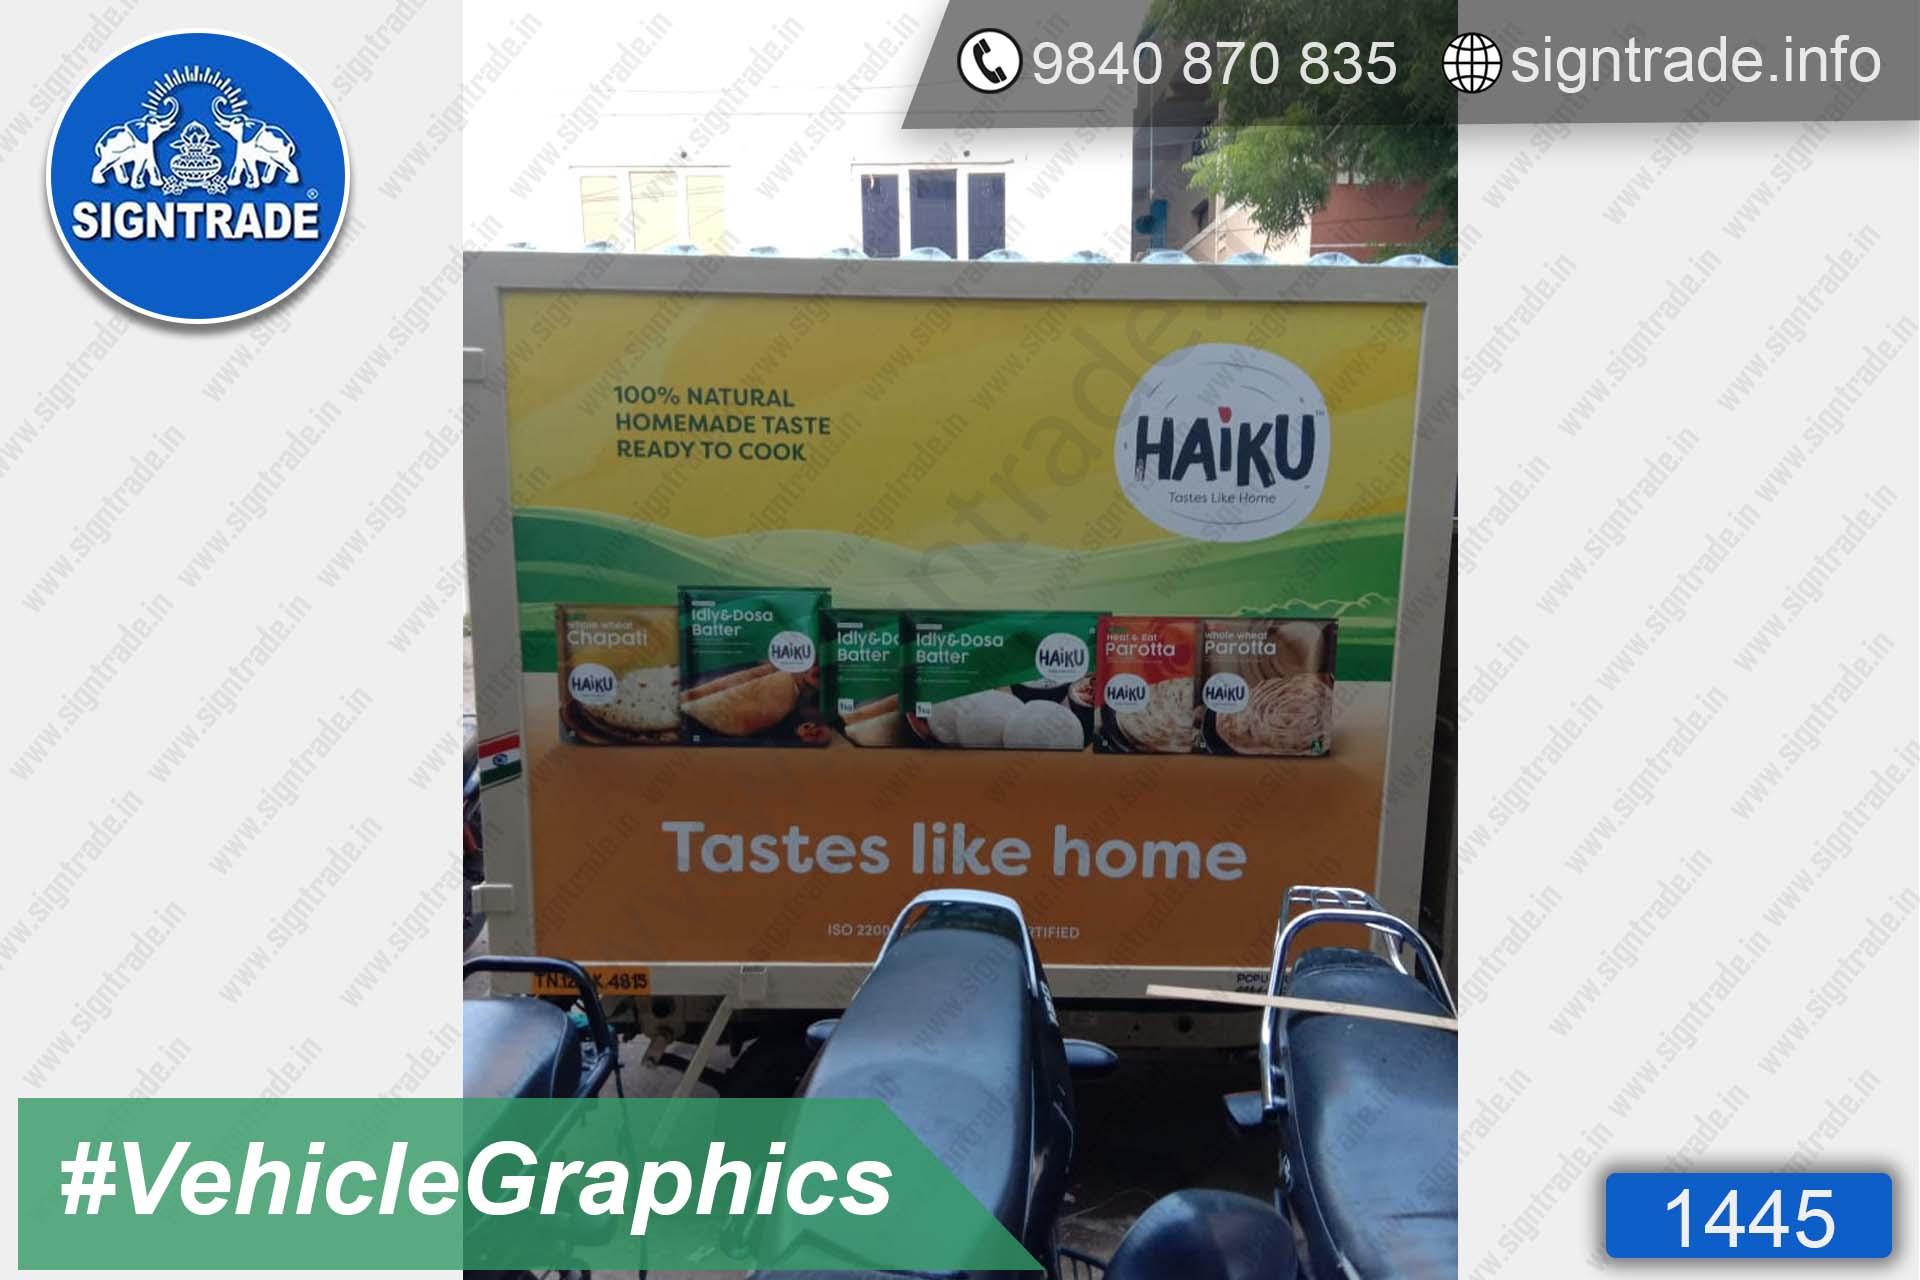 Haiku tastes like home - 1445, Vehicle Graphics, Vehicle Wrapping, Vehicle Branding, Vinyl Vehicle Branding, Van Graphics, Van Wrapping, Van Branding, Vinyl Van Branding, Car Graphics, Car Wrapping, Car Branding, Vinyl Car Branding, Car Stickers, Van Car Stickers